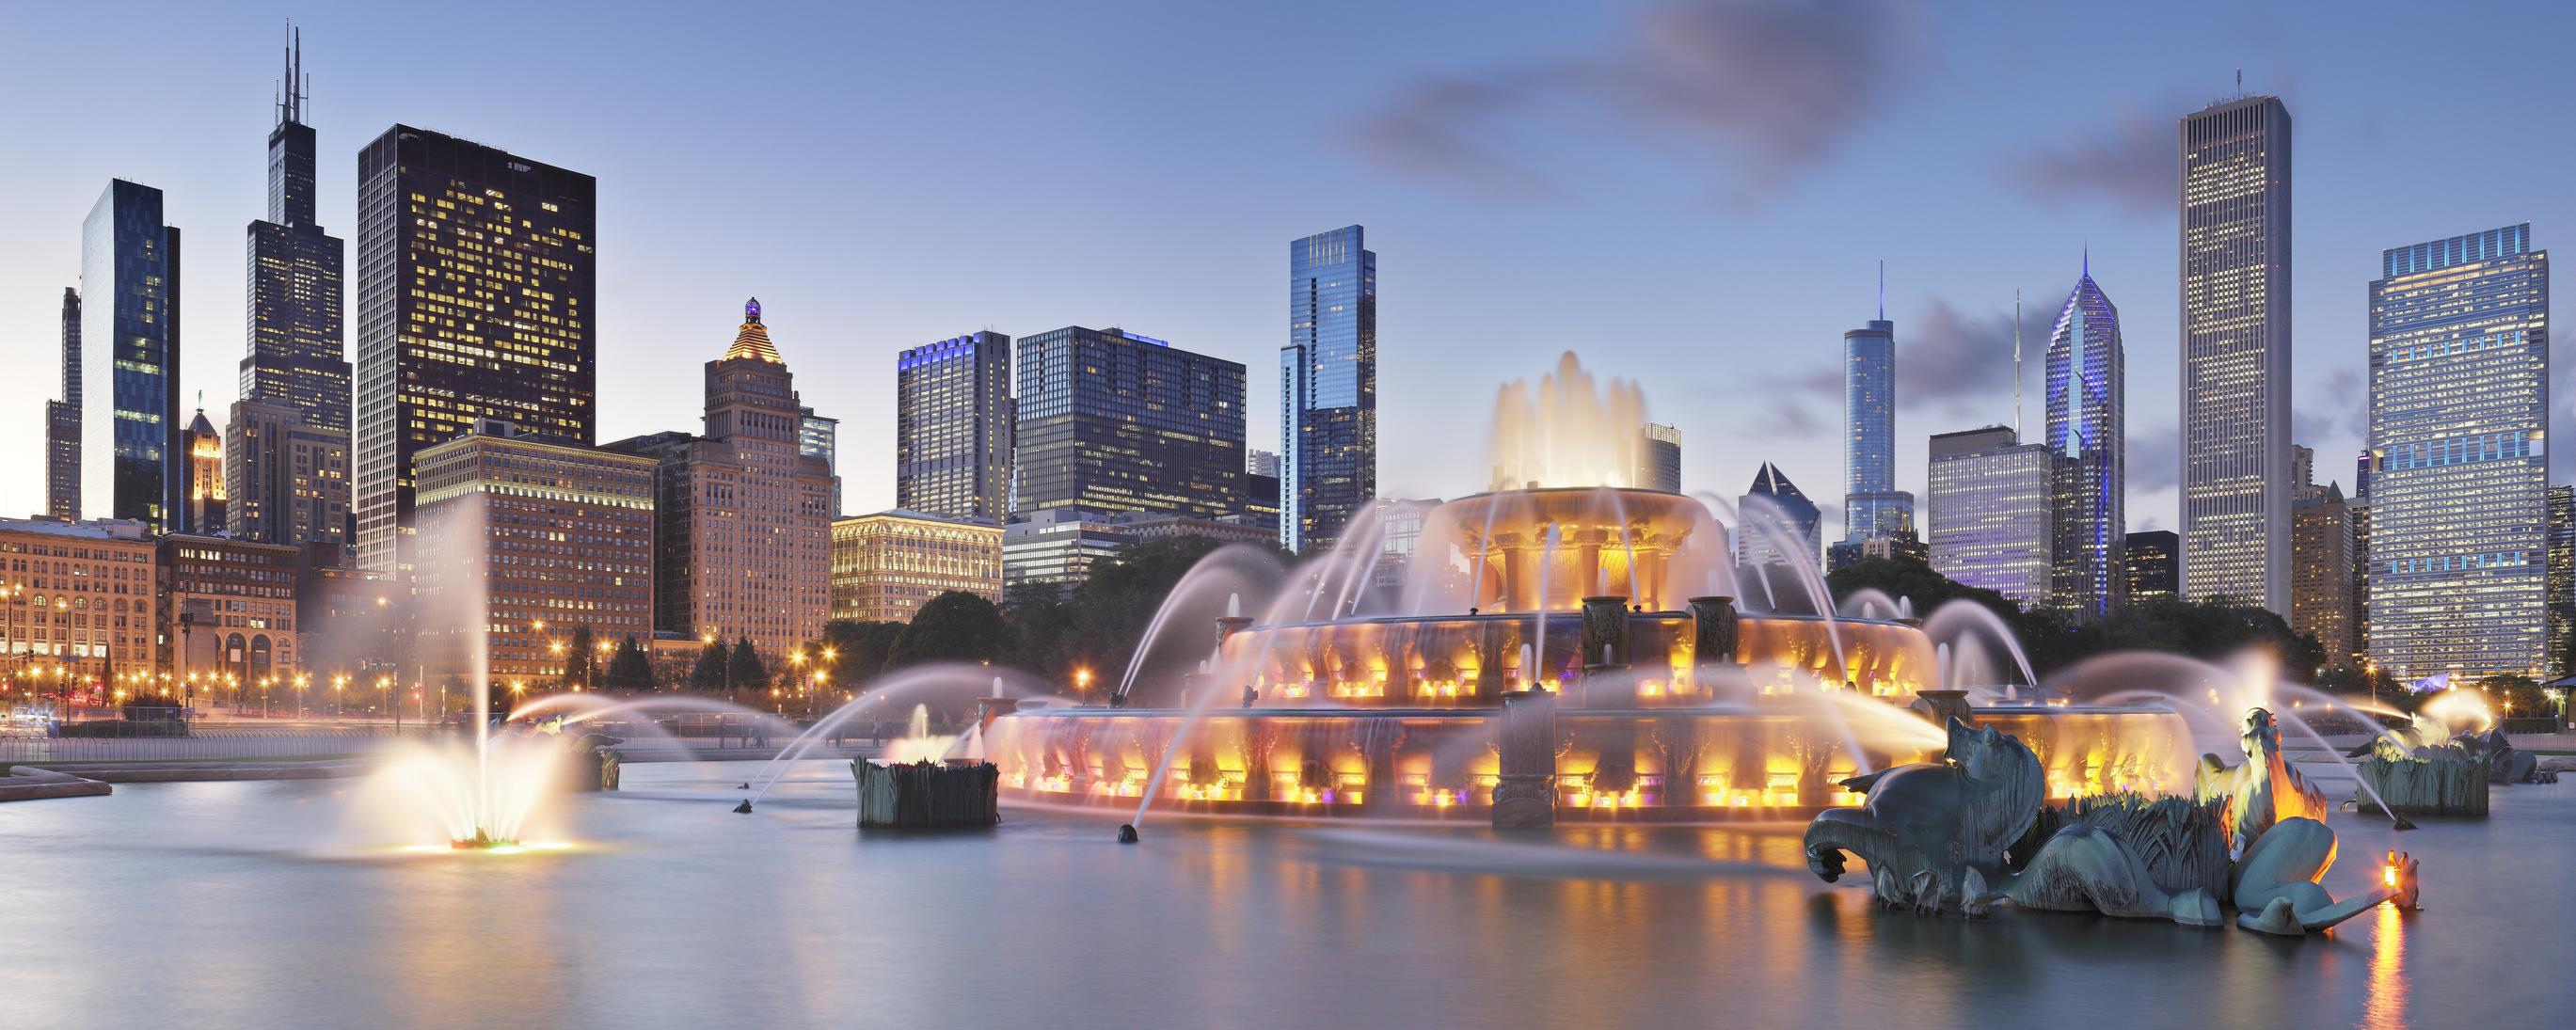 Buckingham Fountain + Skyline at Night - Chicago